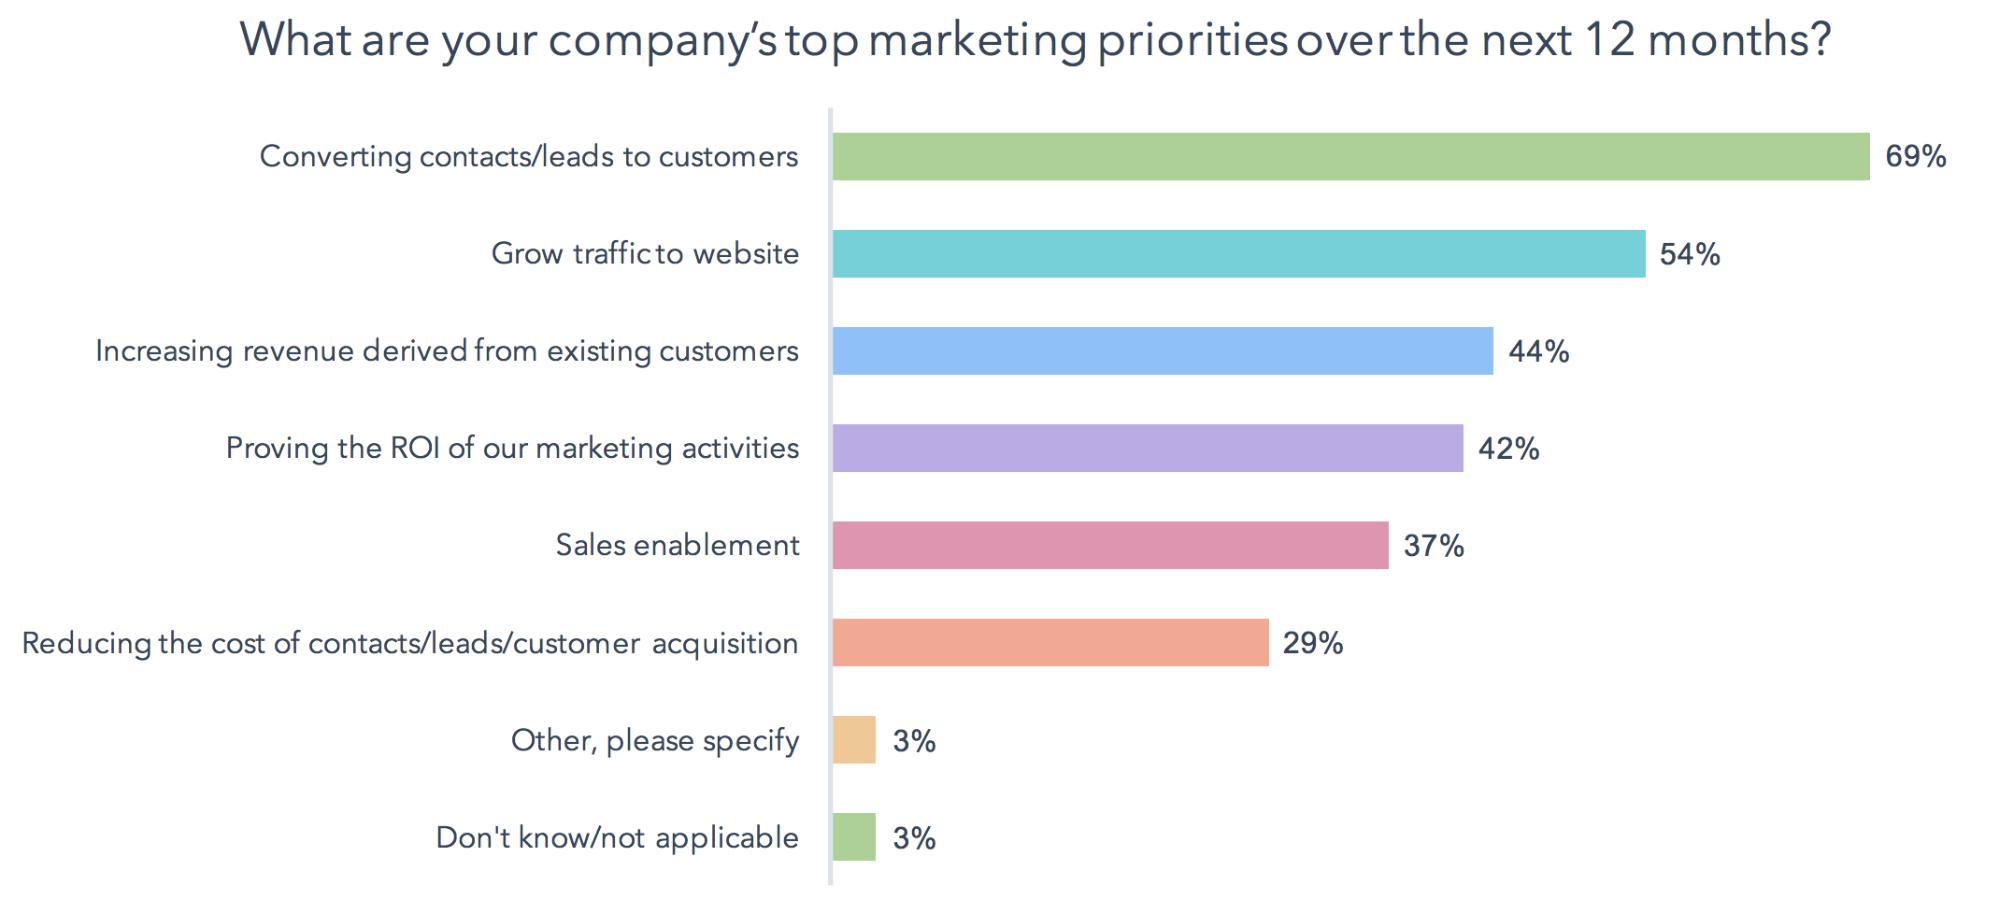 Company's top marketing priorities